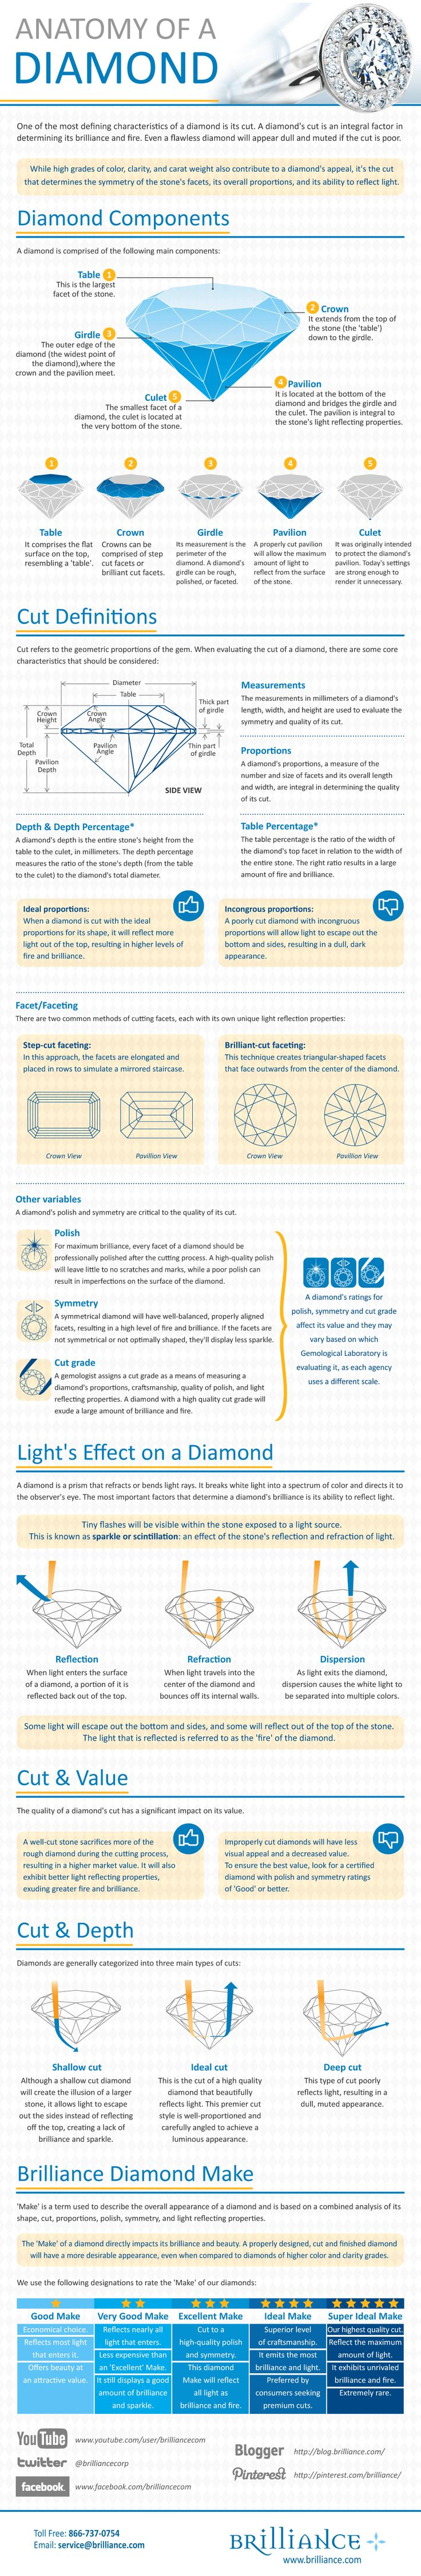 4C's of Loose Diamonds Infograph